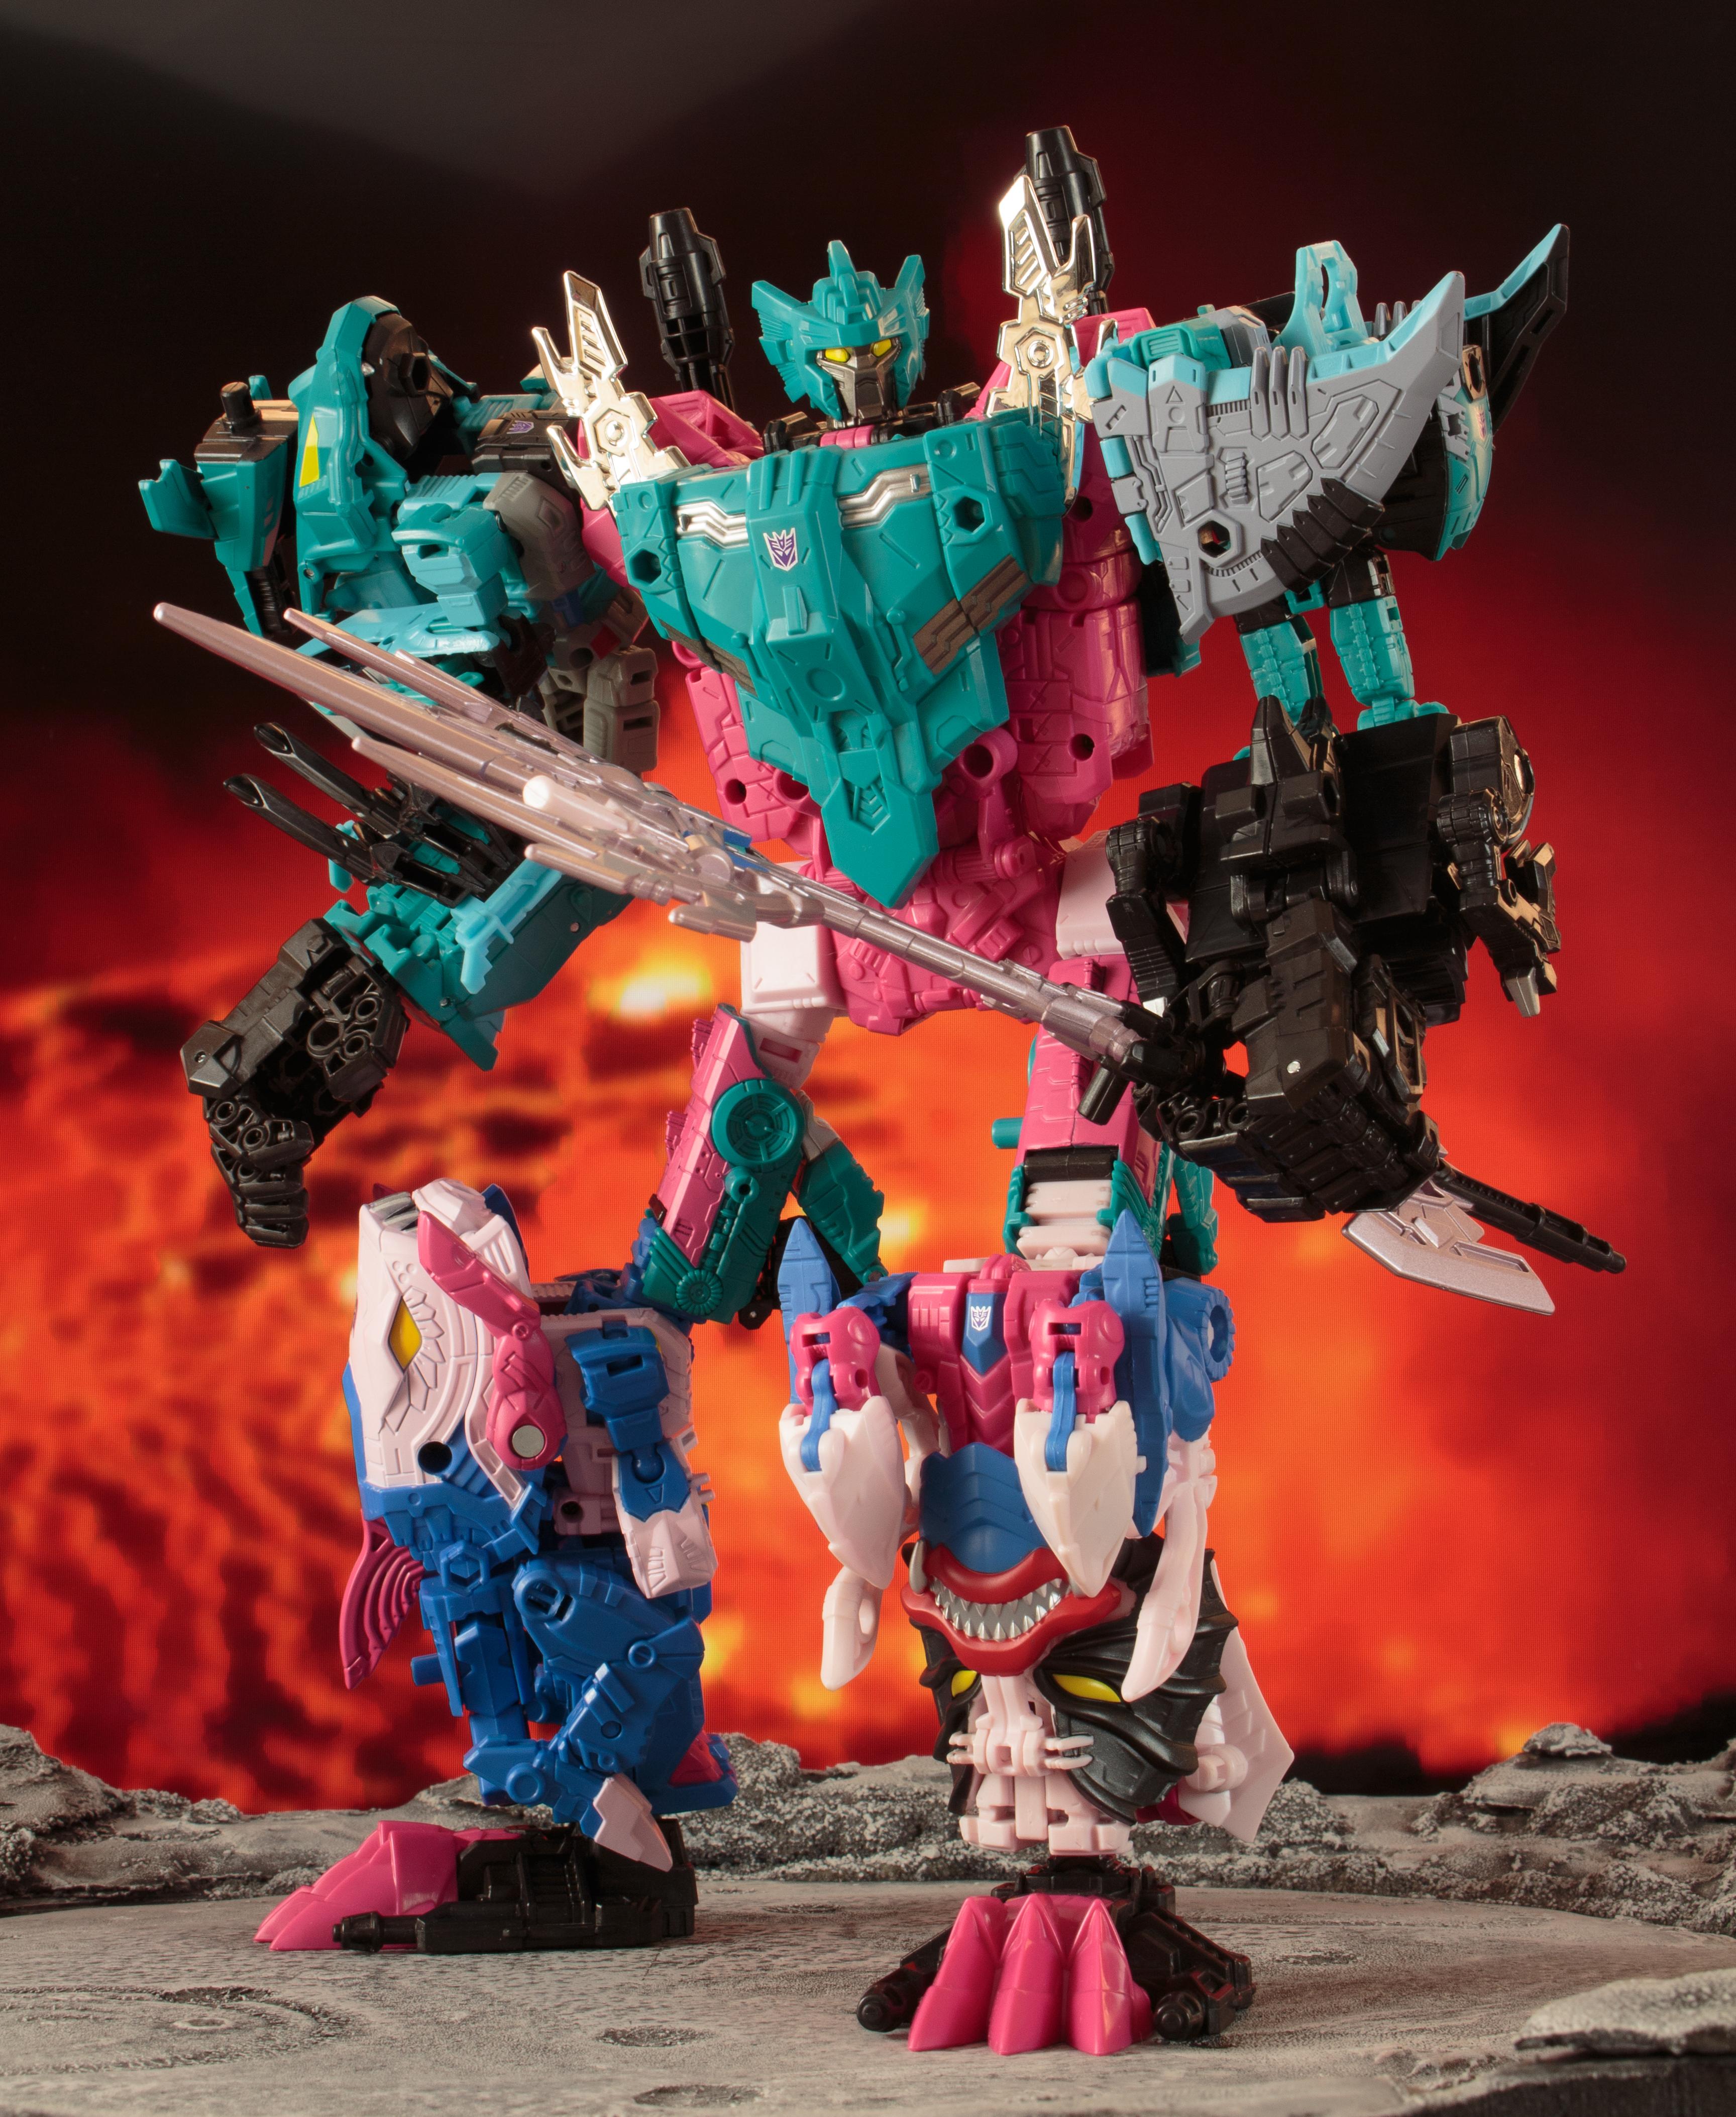 king-poseidon-transformers-combiner-wars